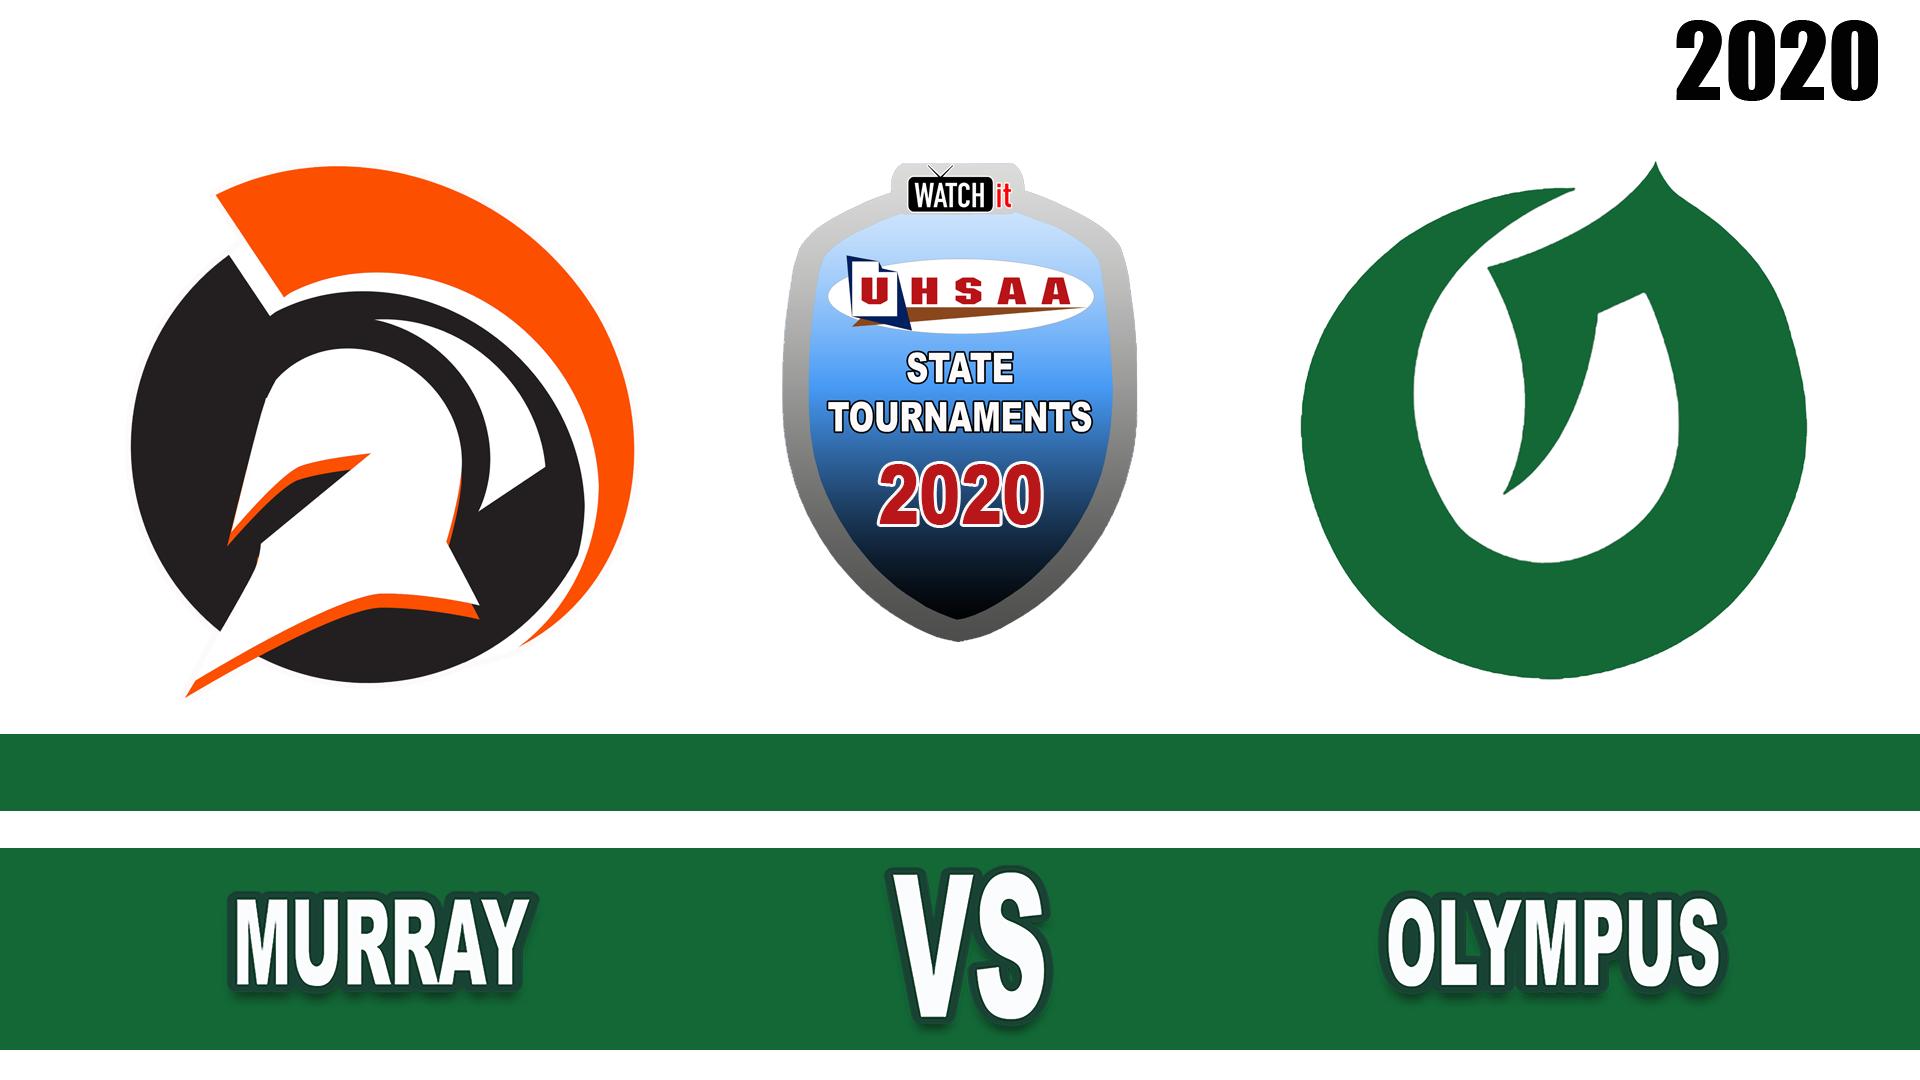 Murray vs Olympus